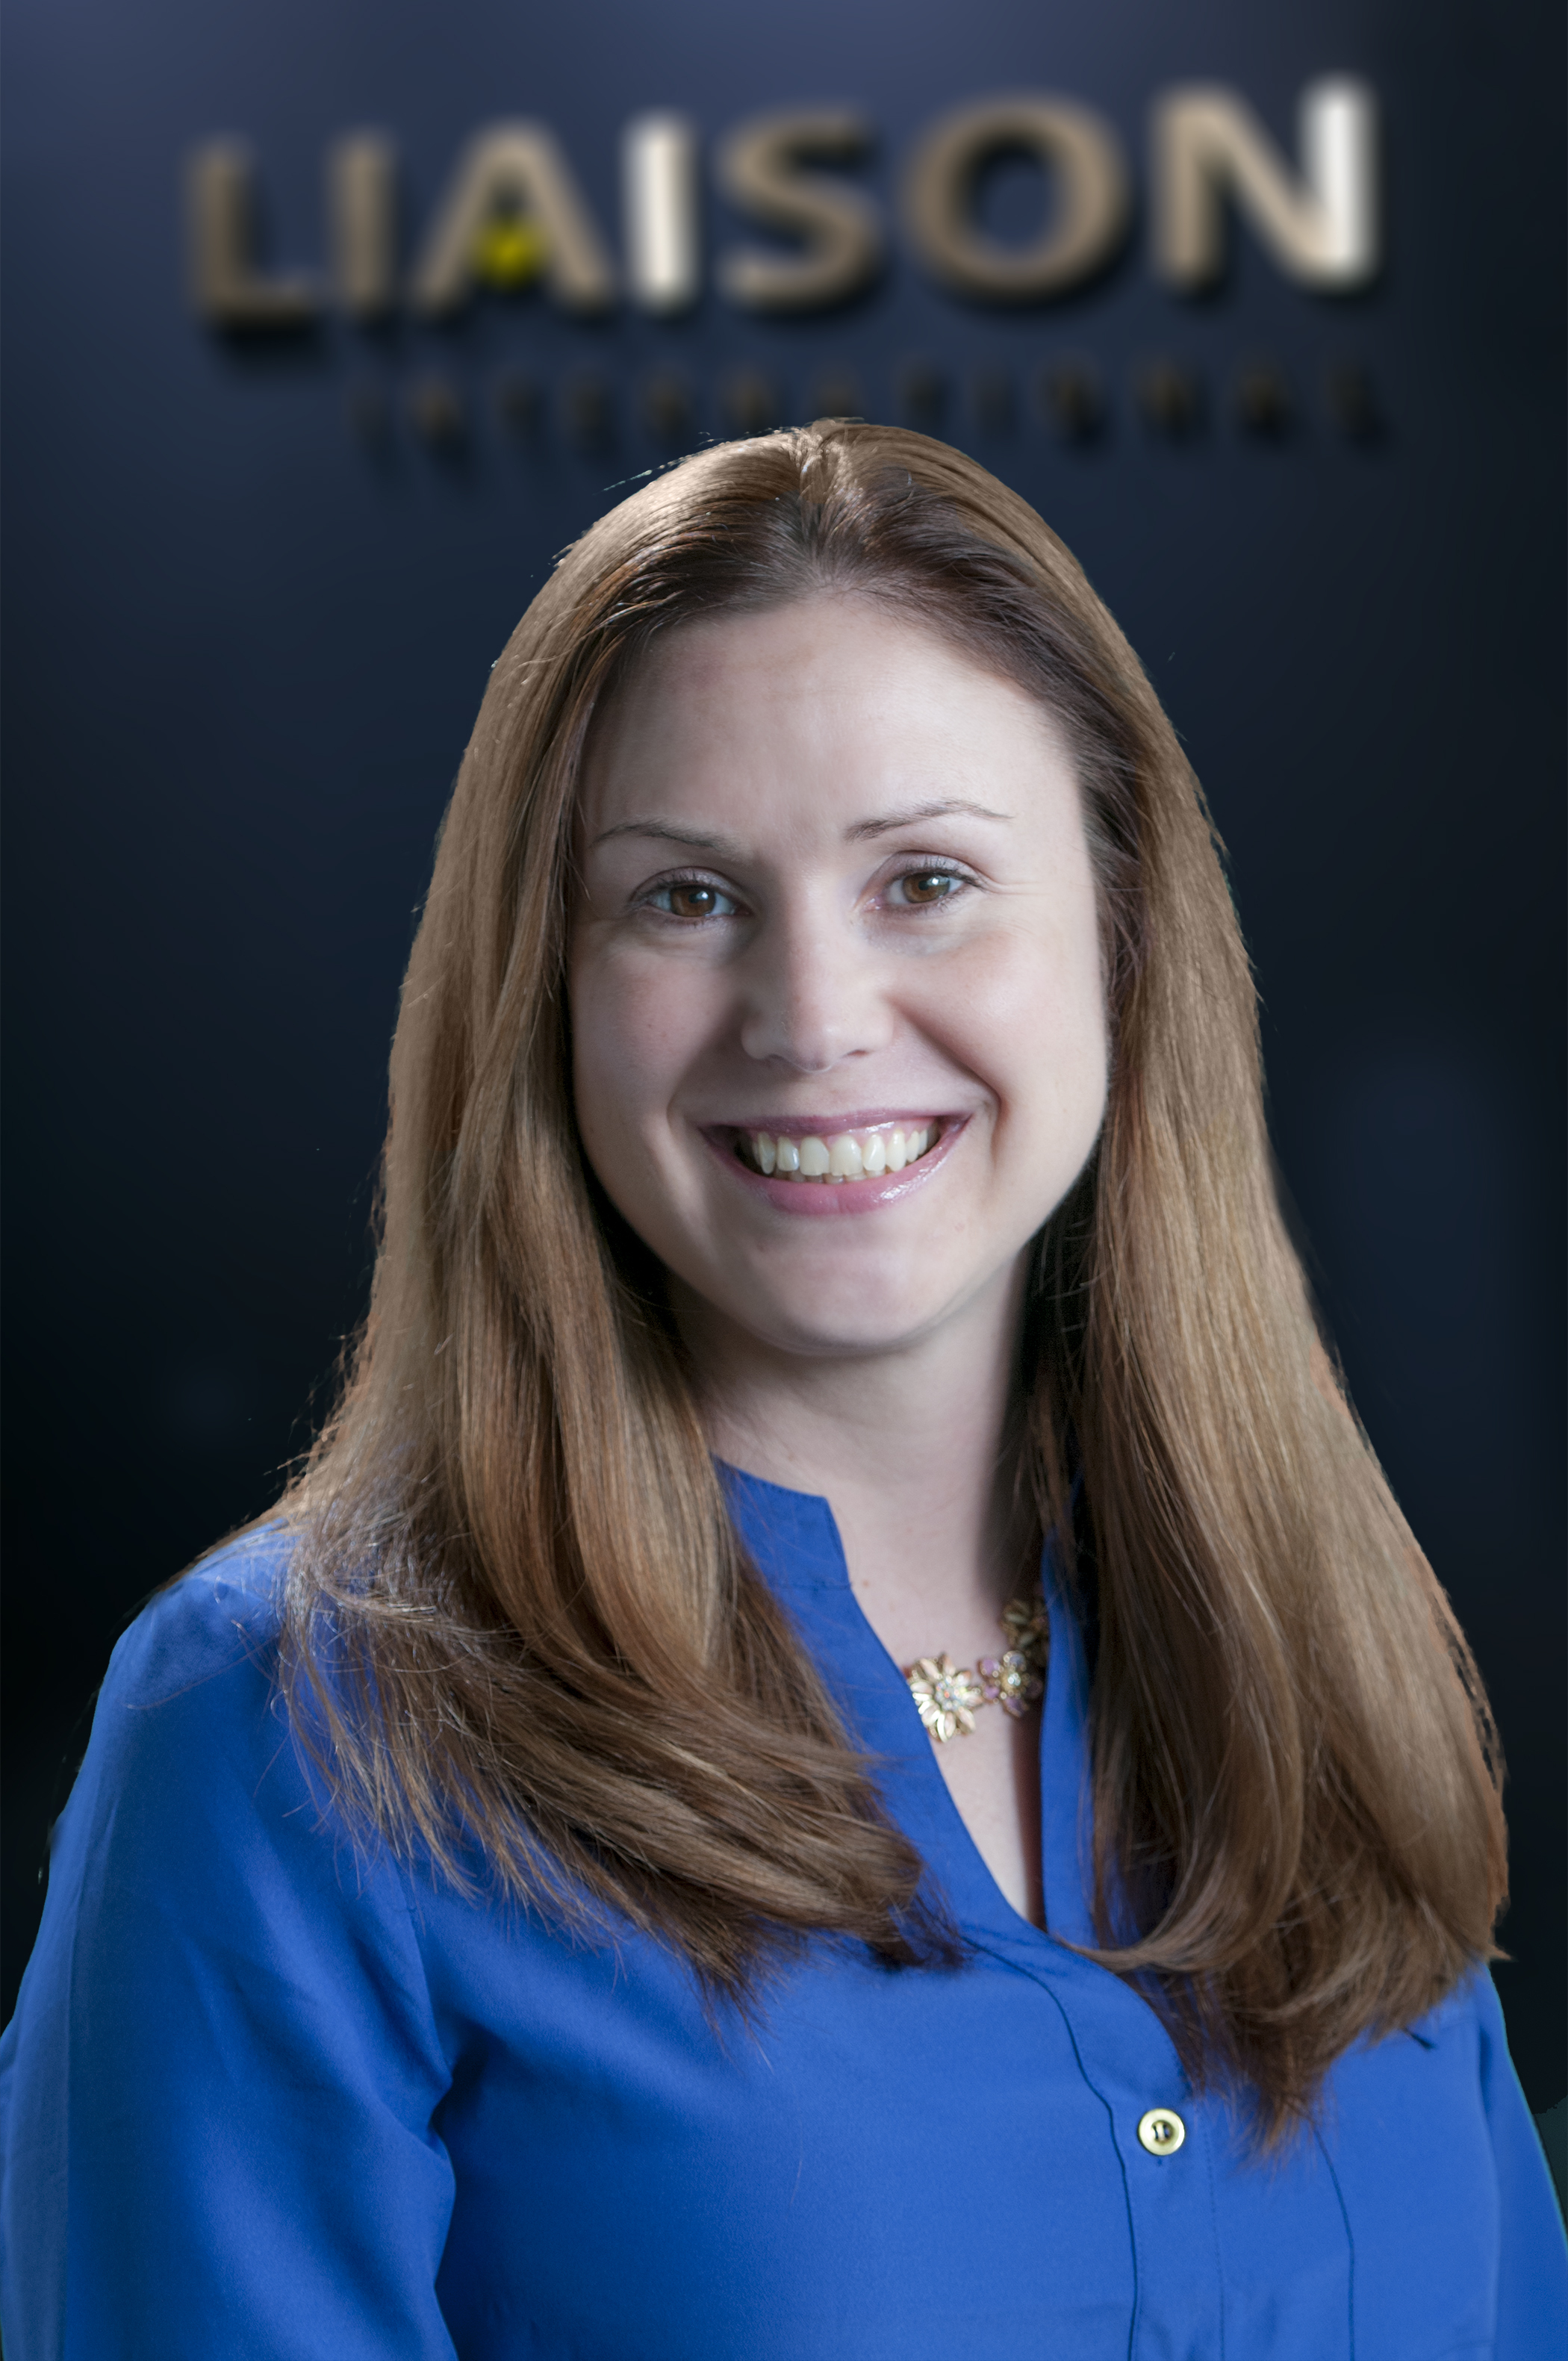 Allison Snow, Director of Marketing, Liaison International (Photo: Business Wire)